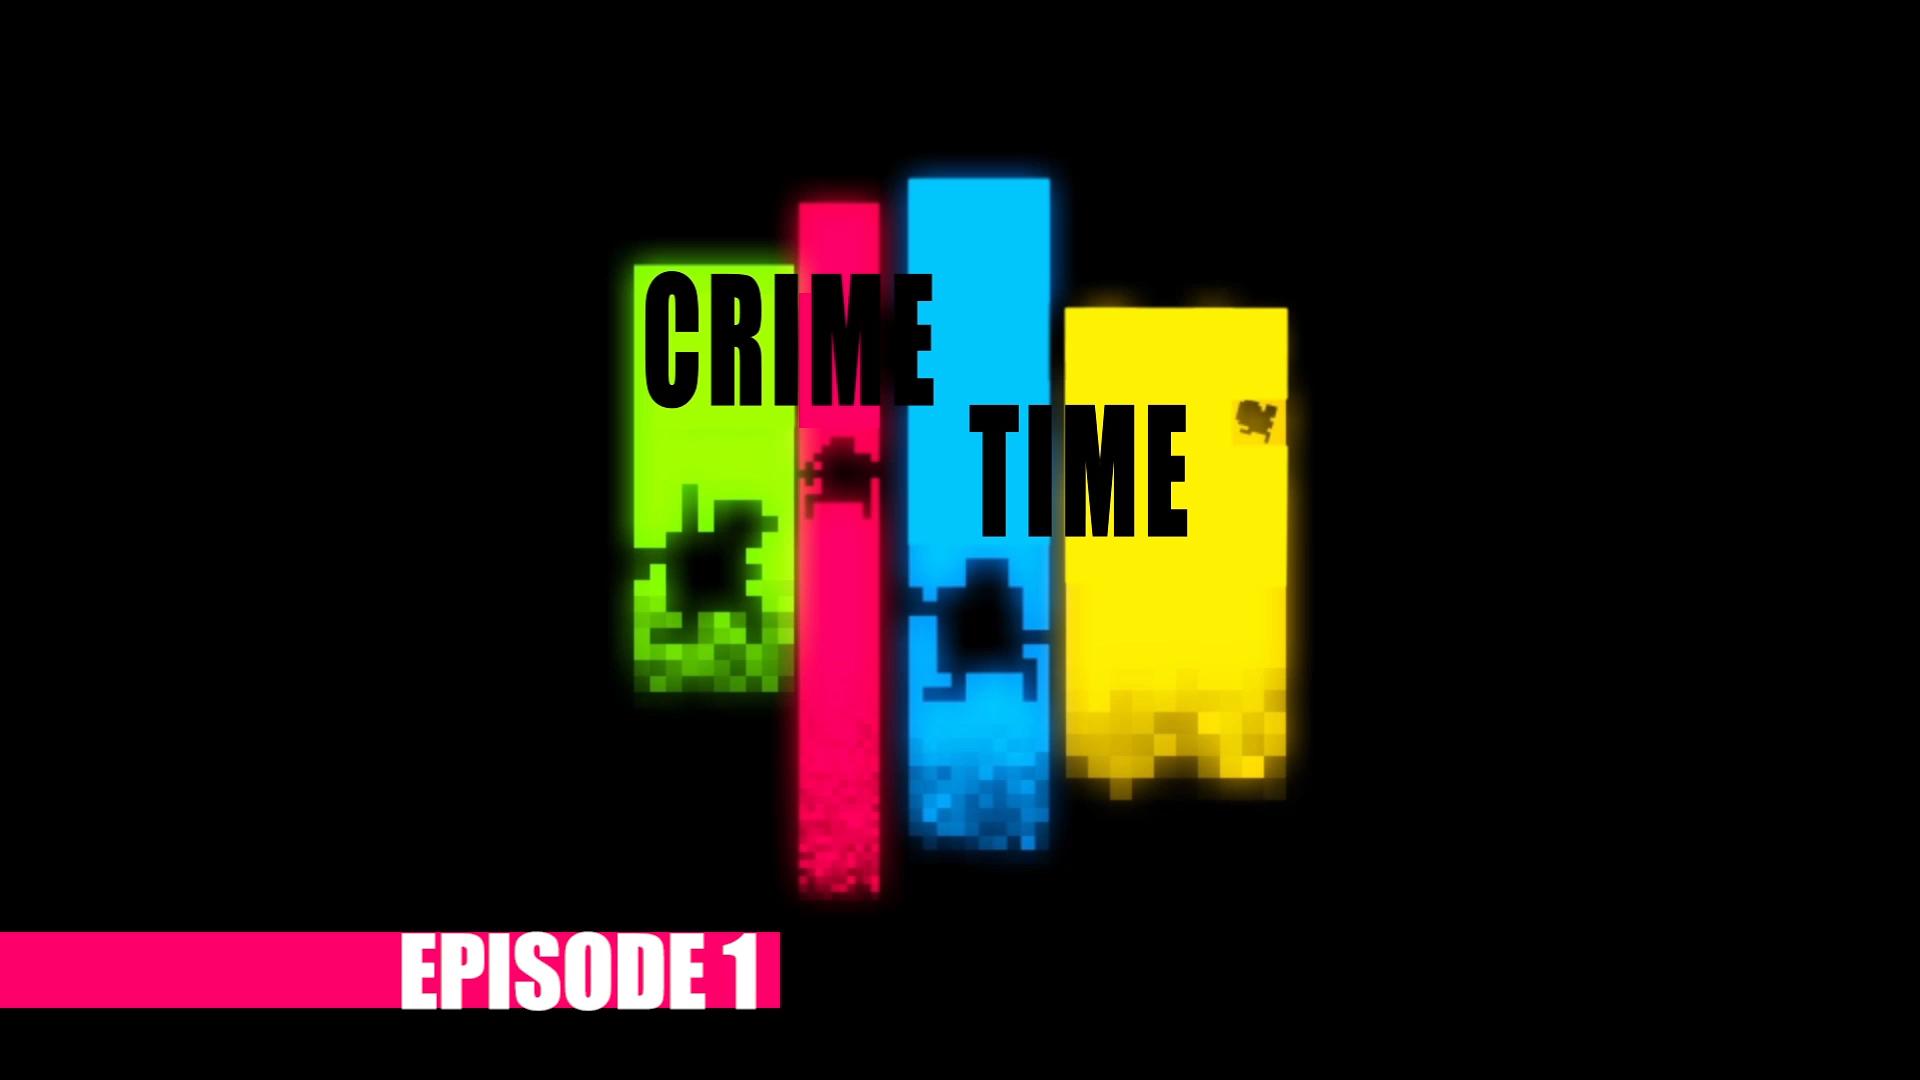 Crime Time Episode 1.jpg